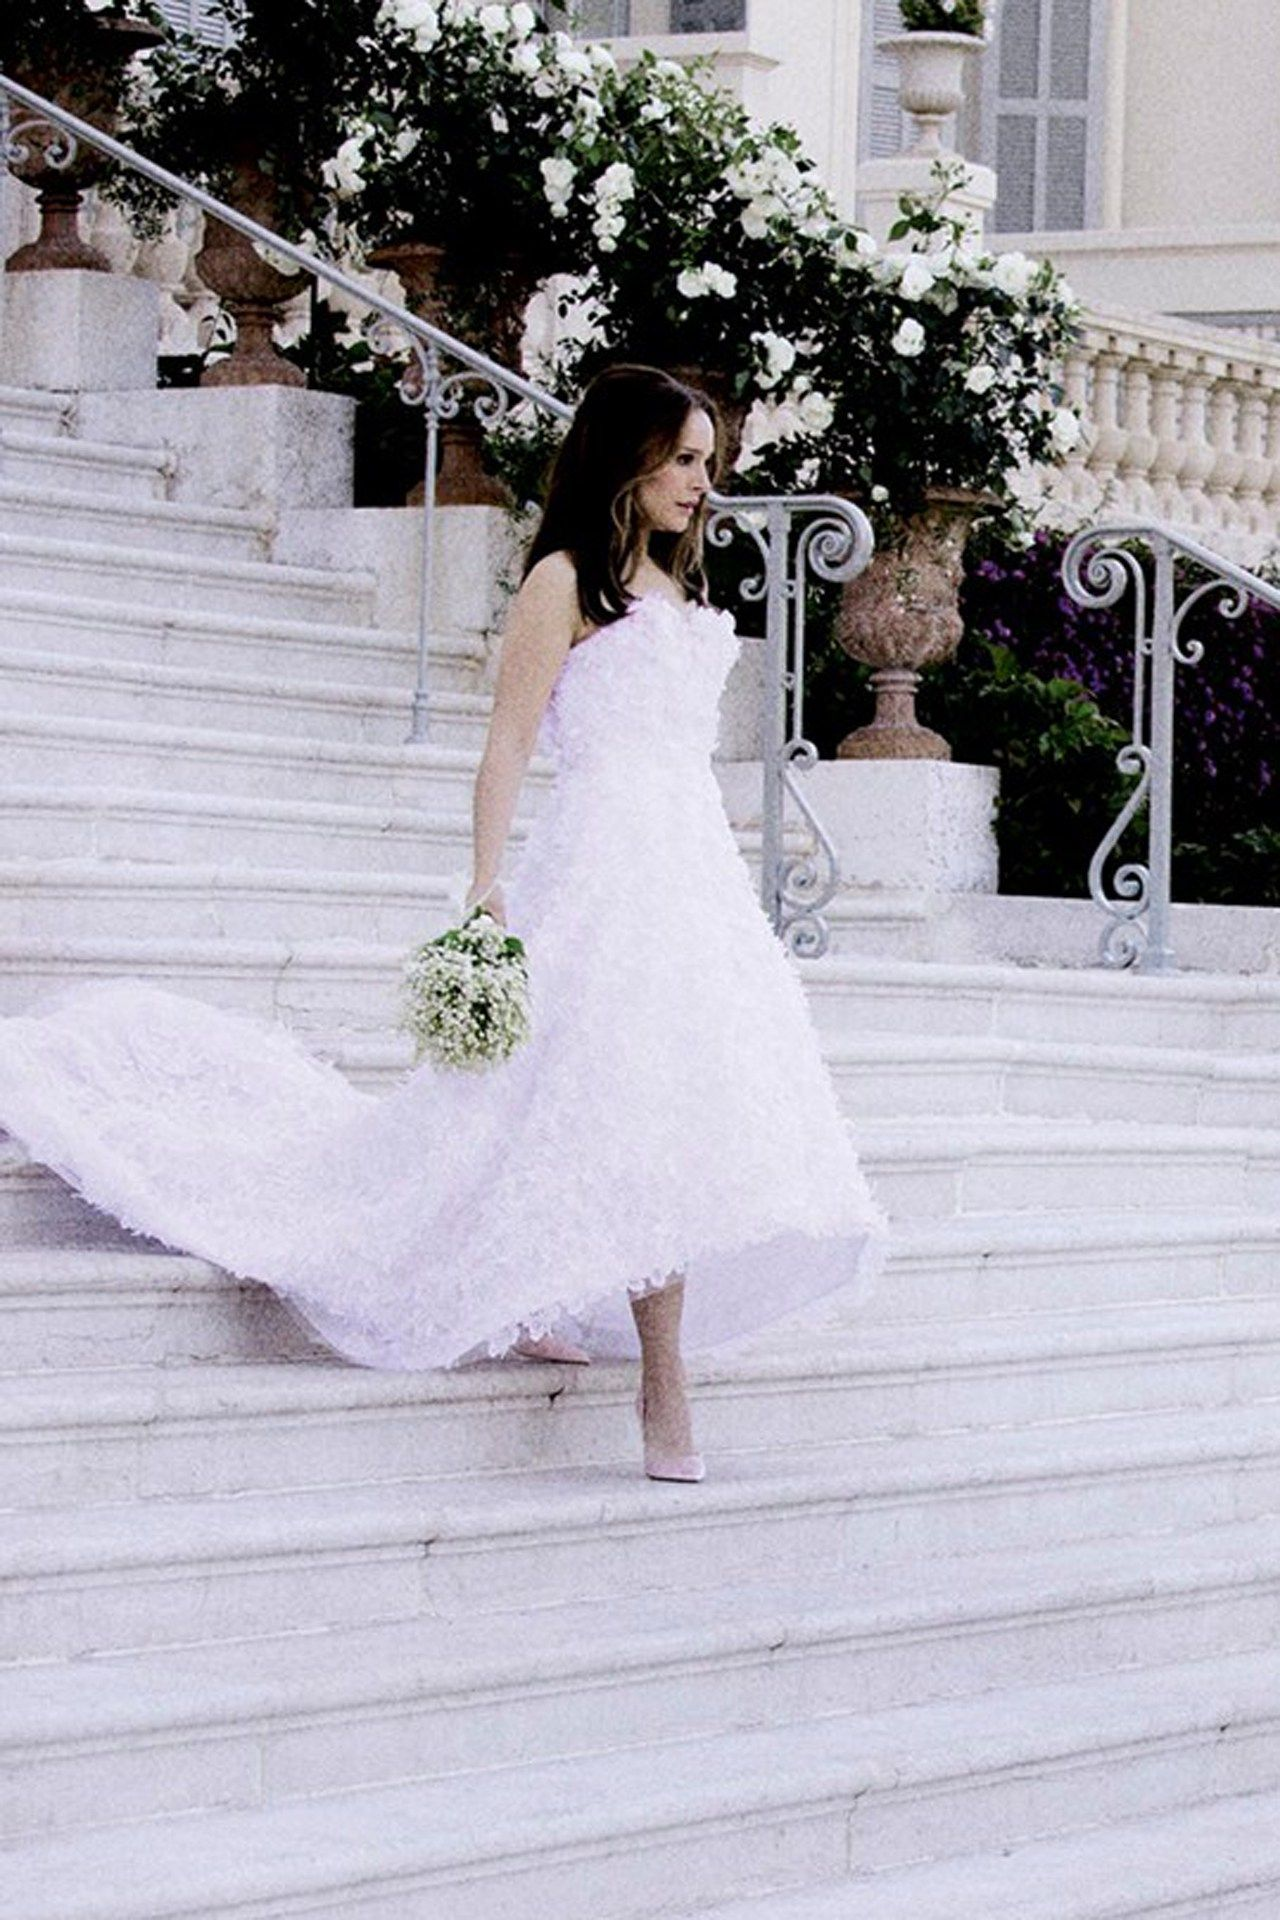 Miss Dior Advert - Natalie Portman. Watch the full film (Vogue.co.uk)